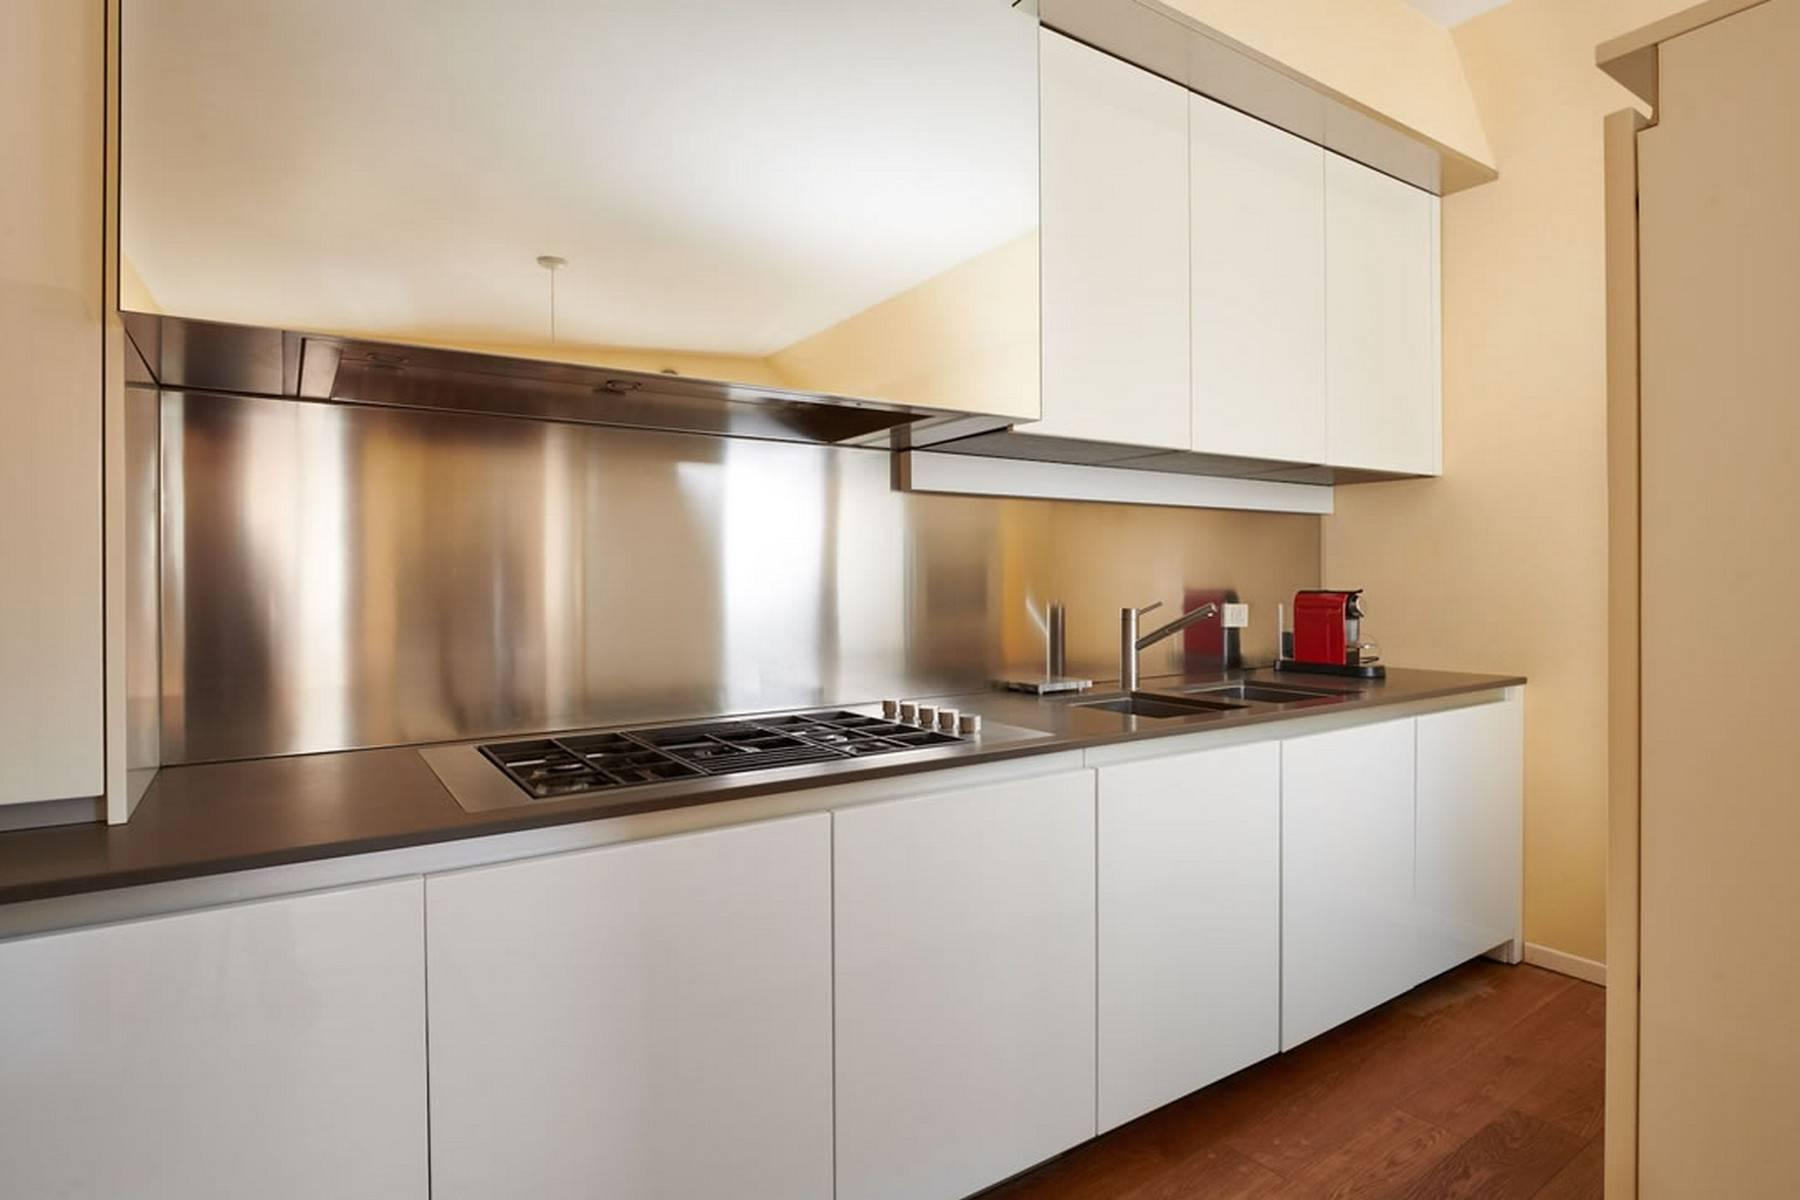 Appartement de design dans le Palazzo Querini Stampalia / S.M. Formosa - 16